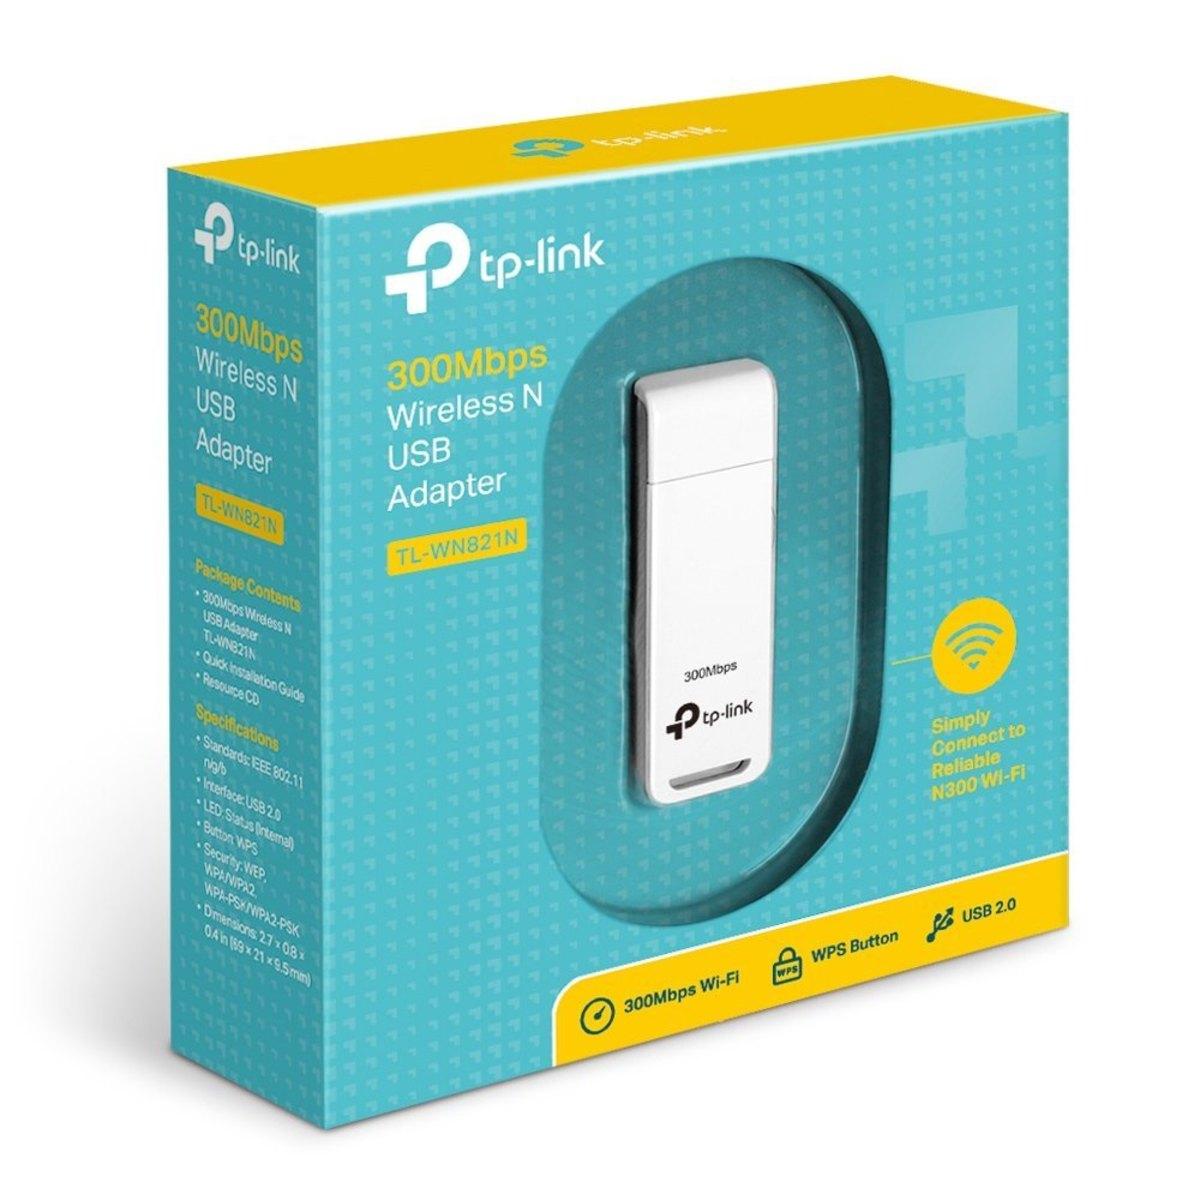 Adaptador Wireless Tp-Link Tl-WN821N USB 300mbps